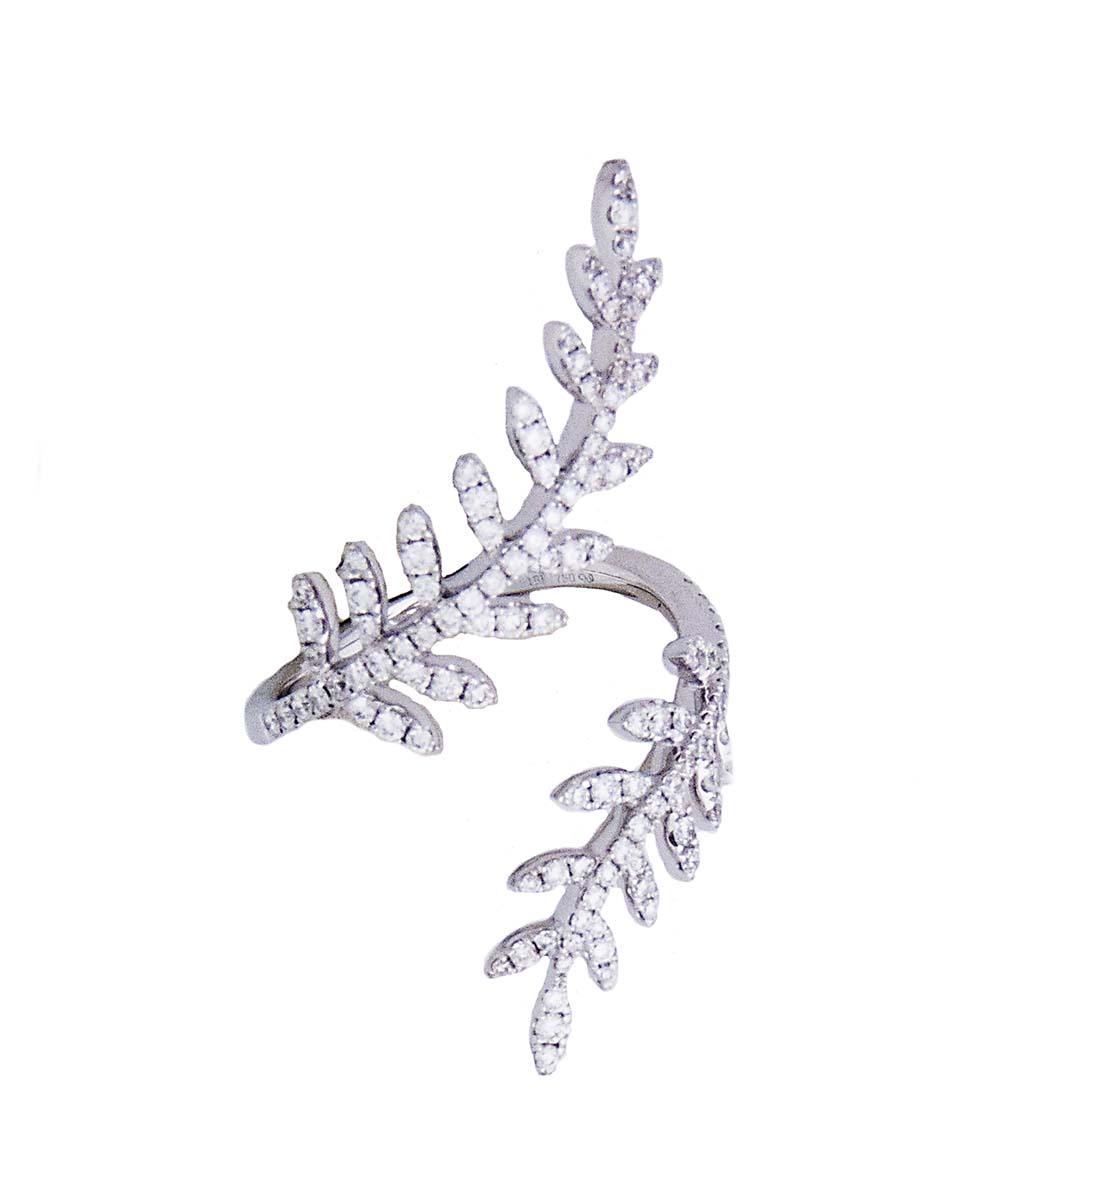 18k white gold and diamond fern leaf open ring